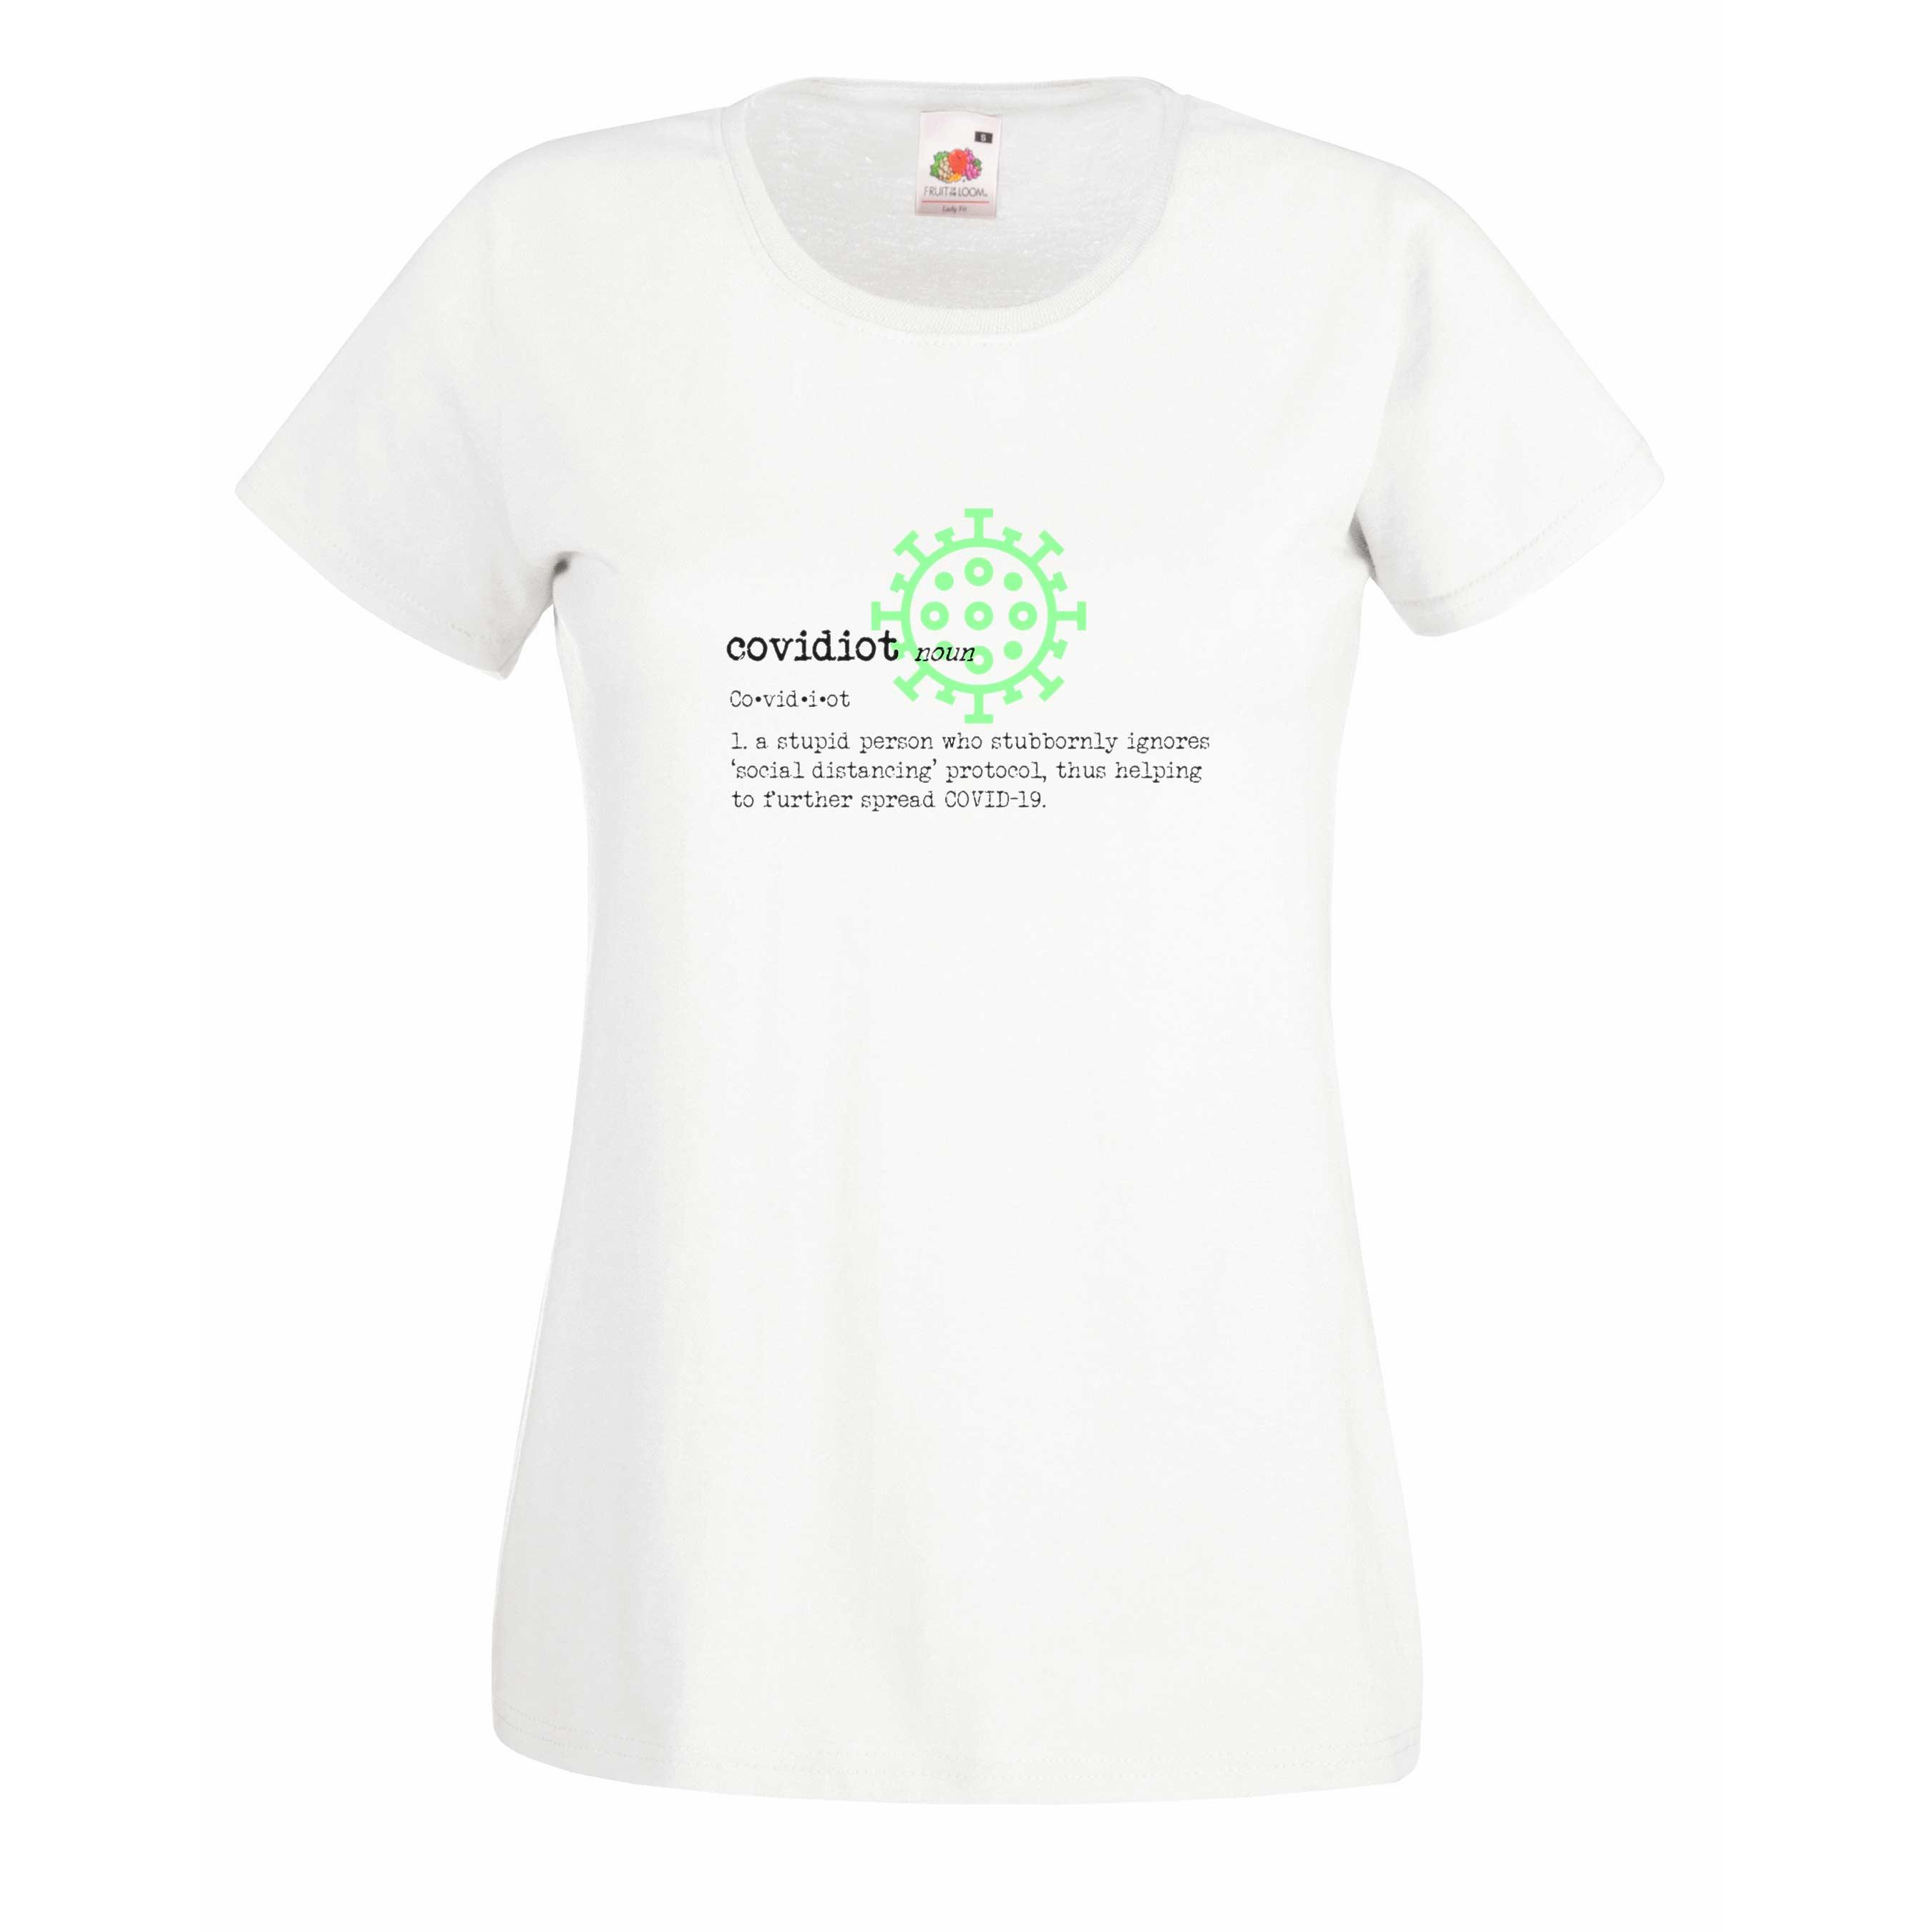 Covidiot design for t-shirt, hoodie & sweatshirt